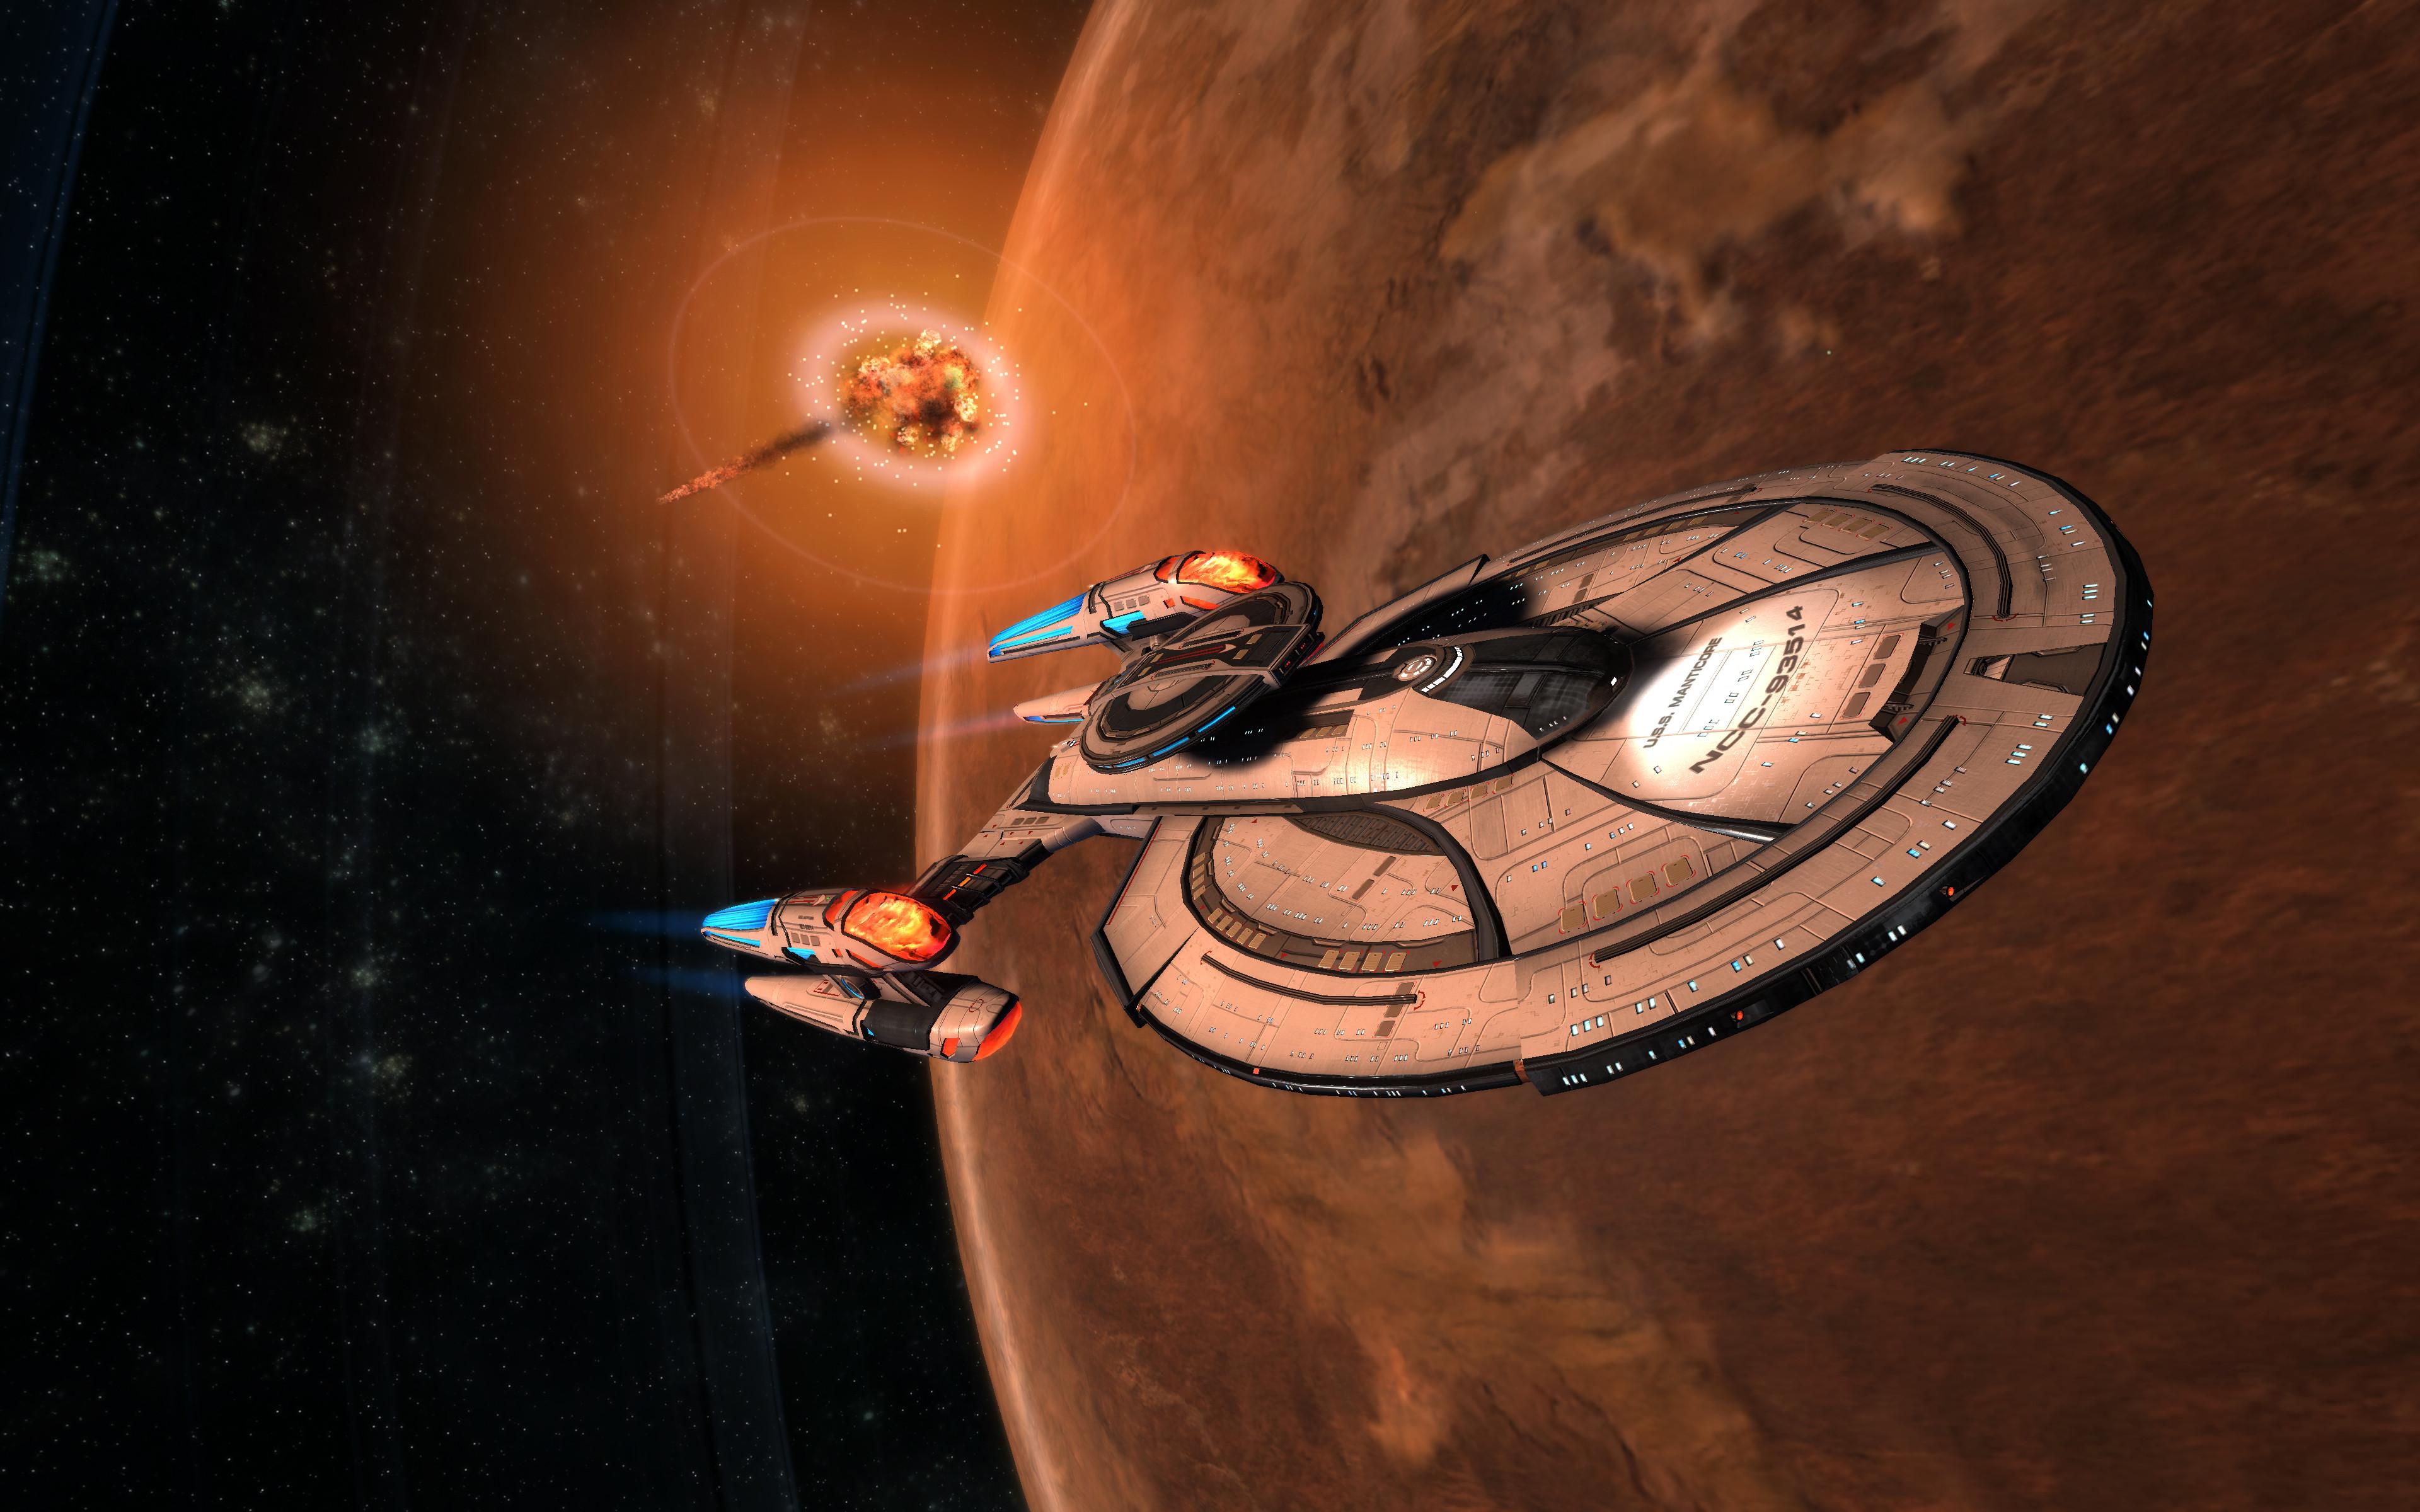 Star Trek Online in-game screenshot